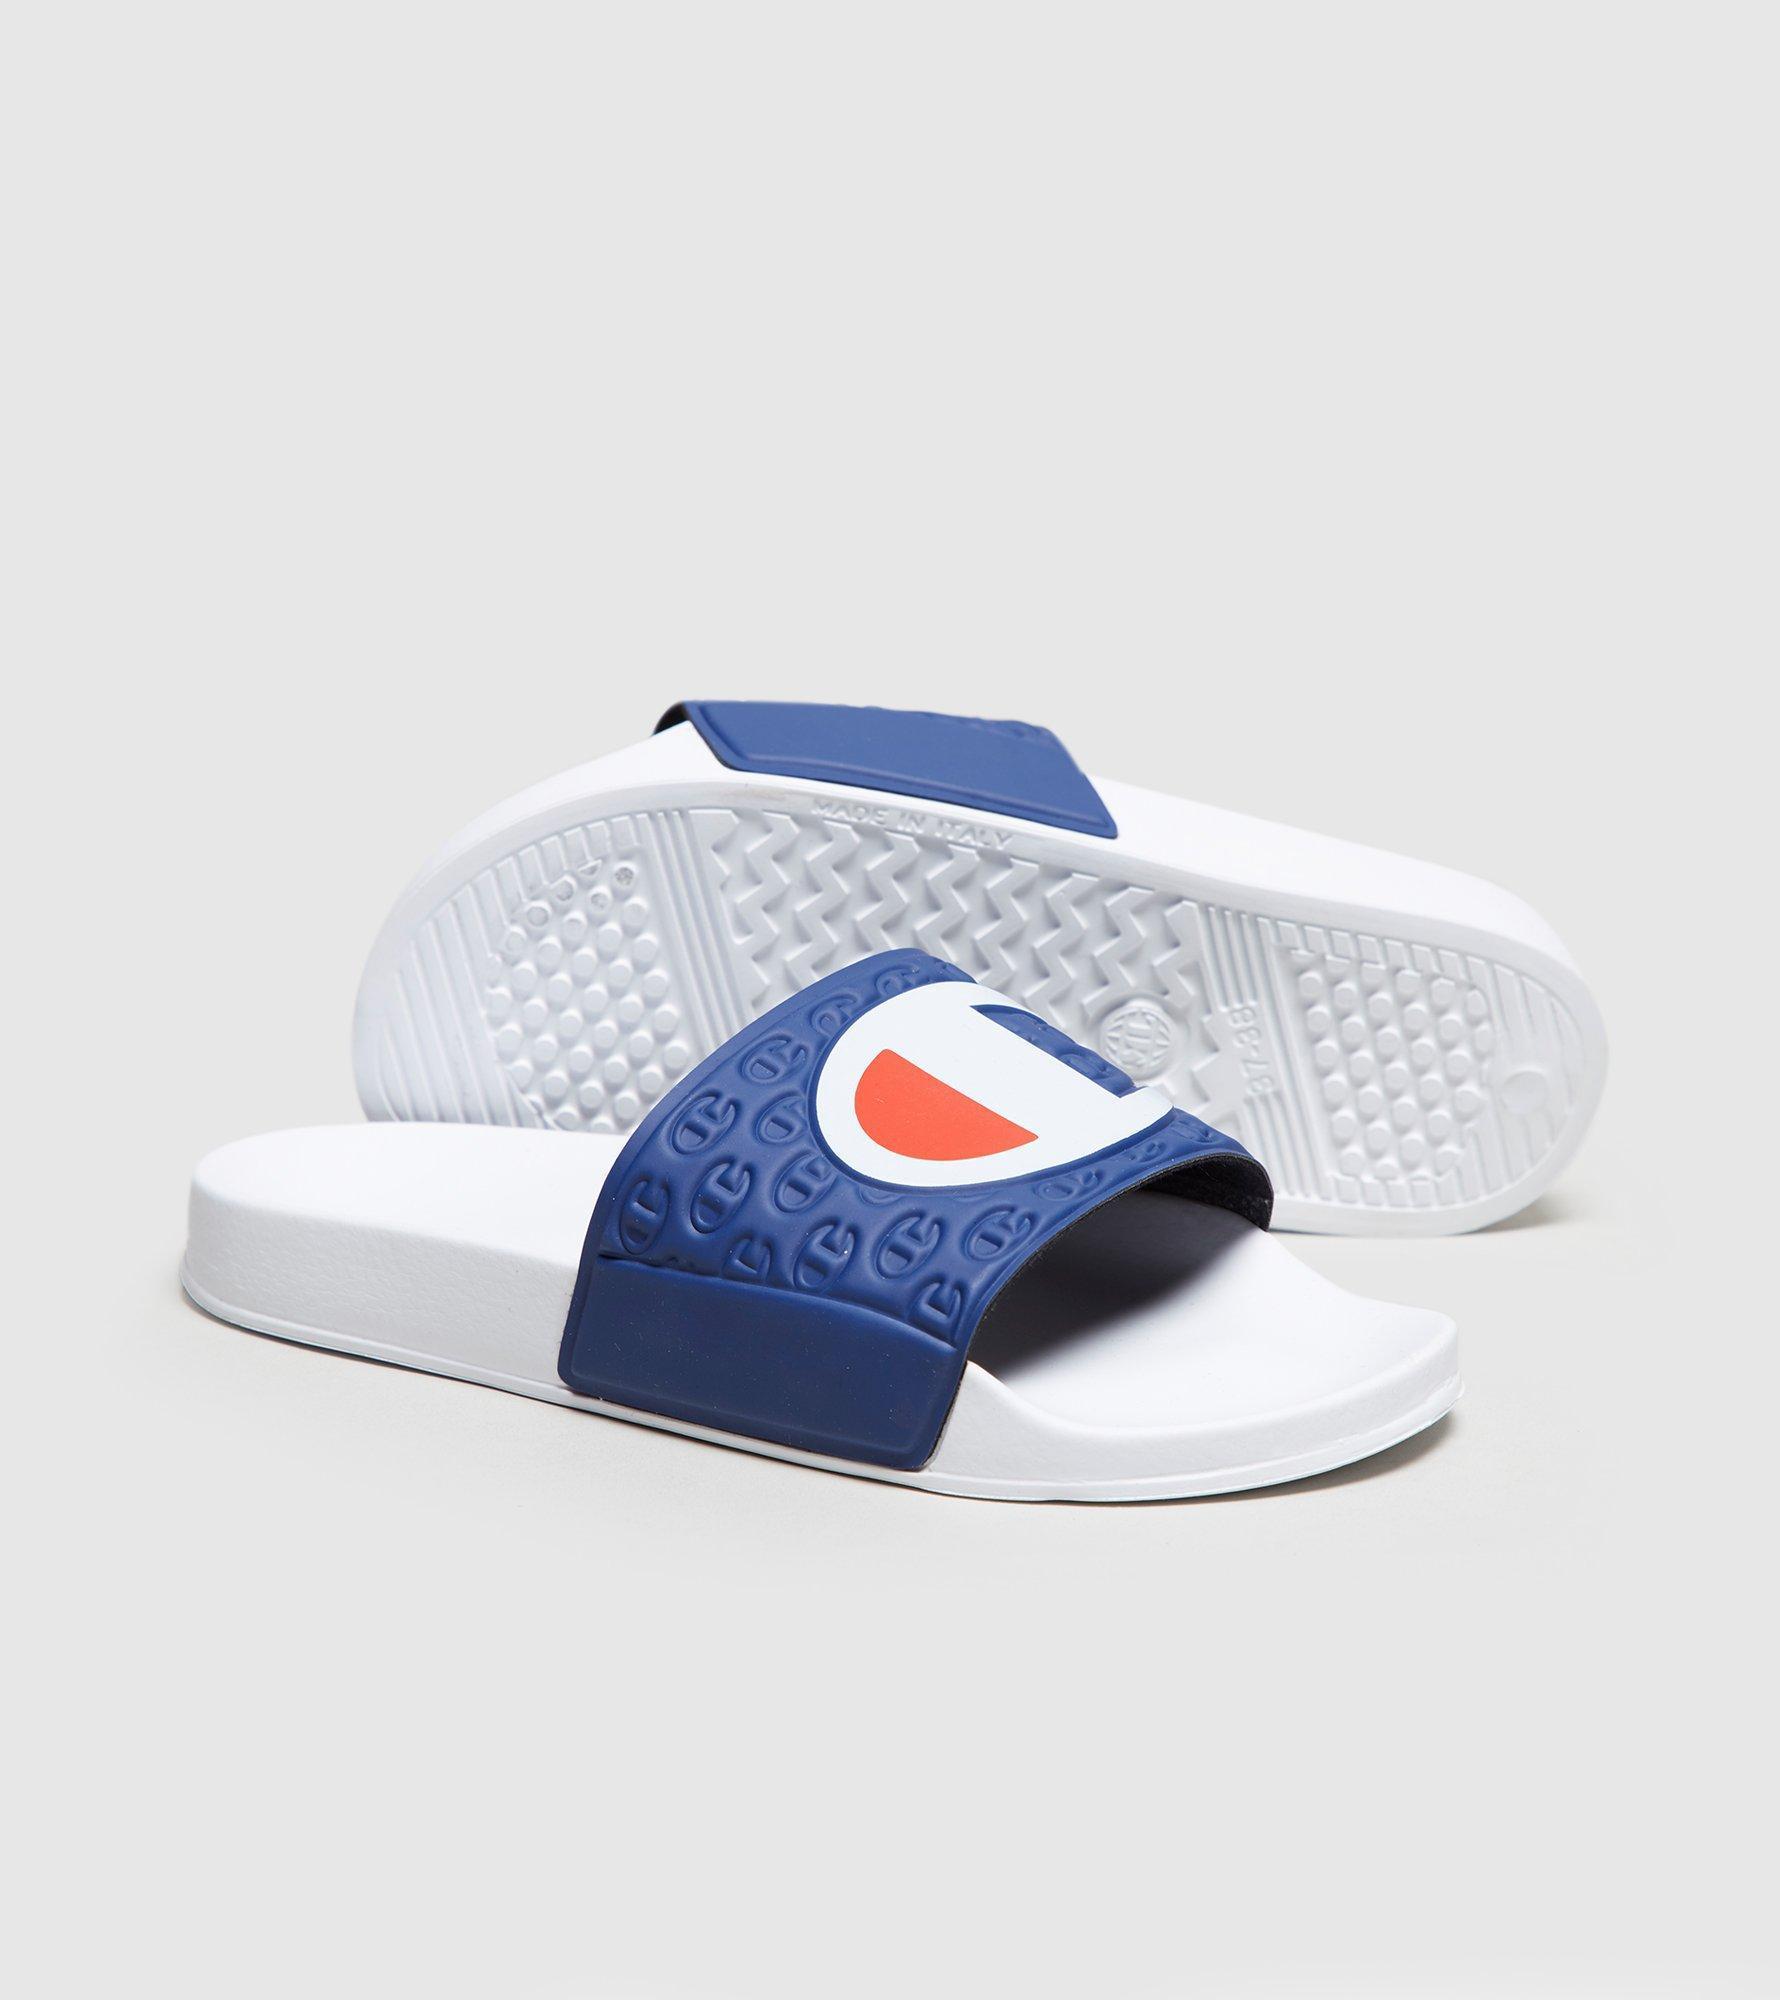 e4d3e1e667478 Lyst - Champion Slides Women s in Blue